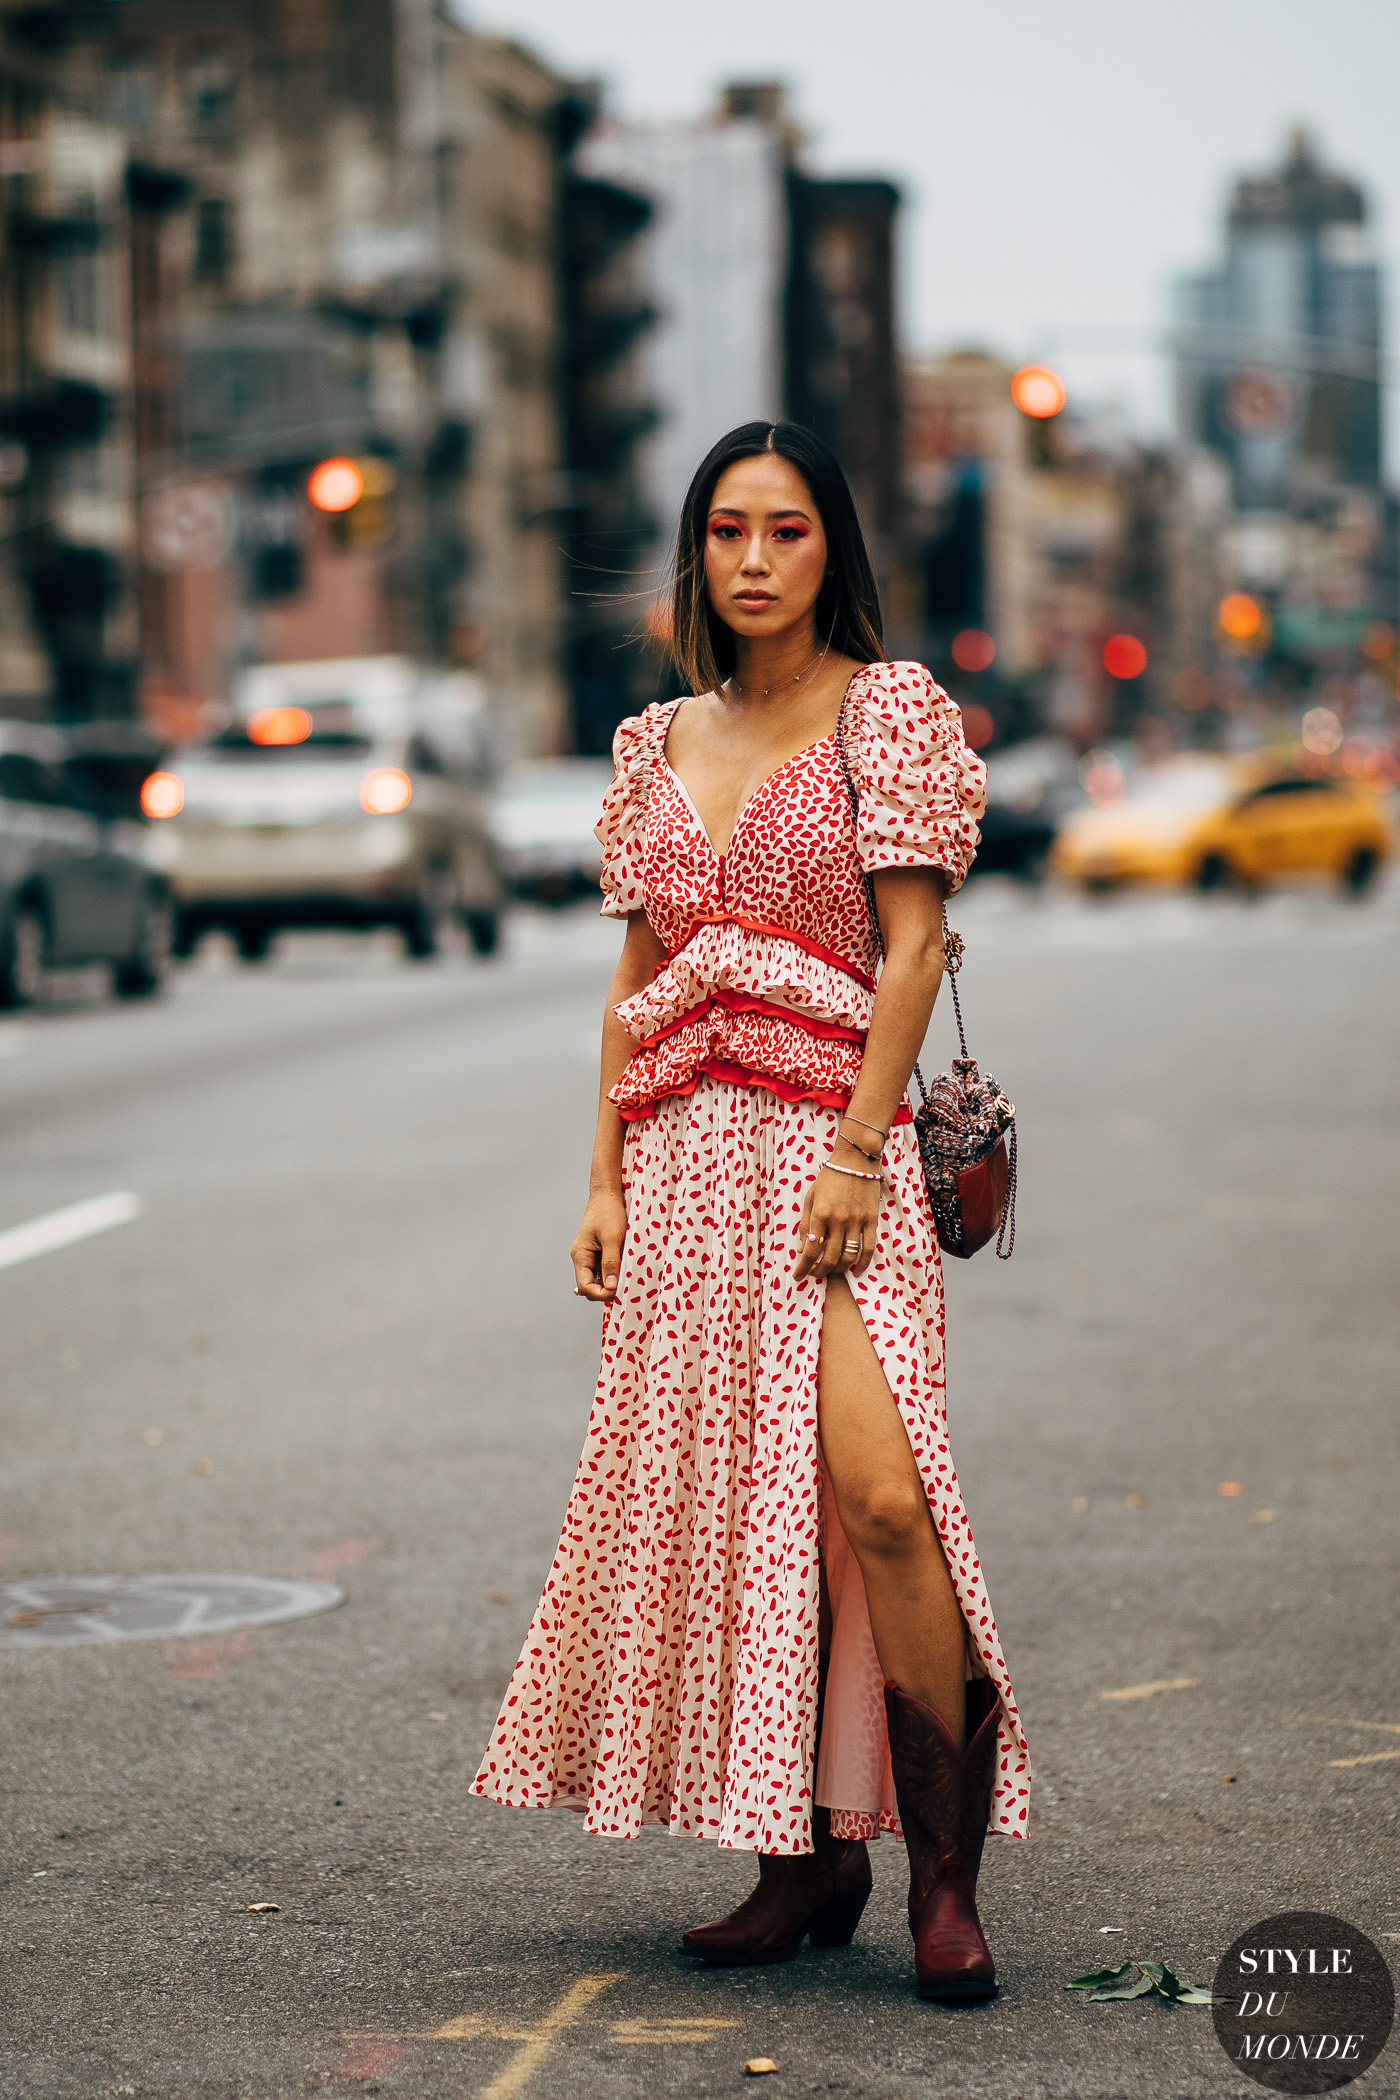 New York FW 2019 Street Style: Aimee Song - STYLE DU MONDE